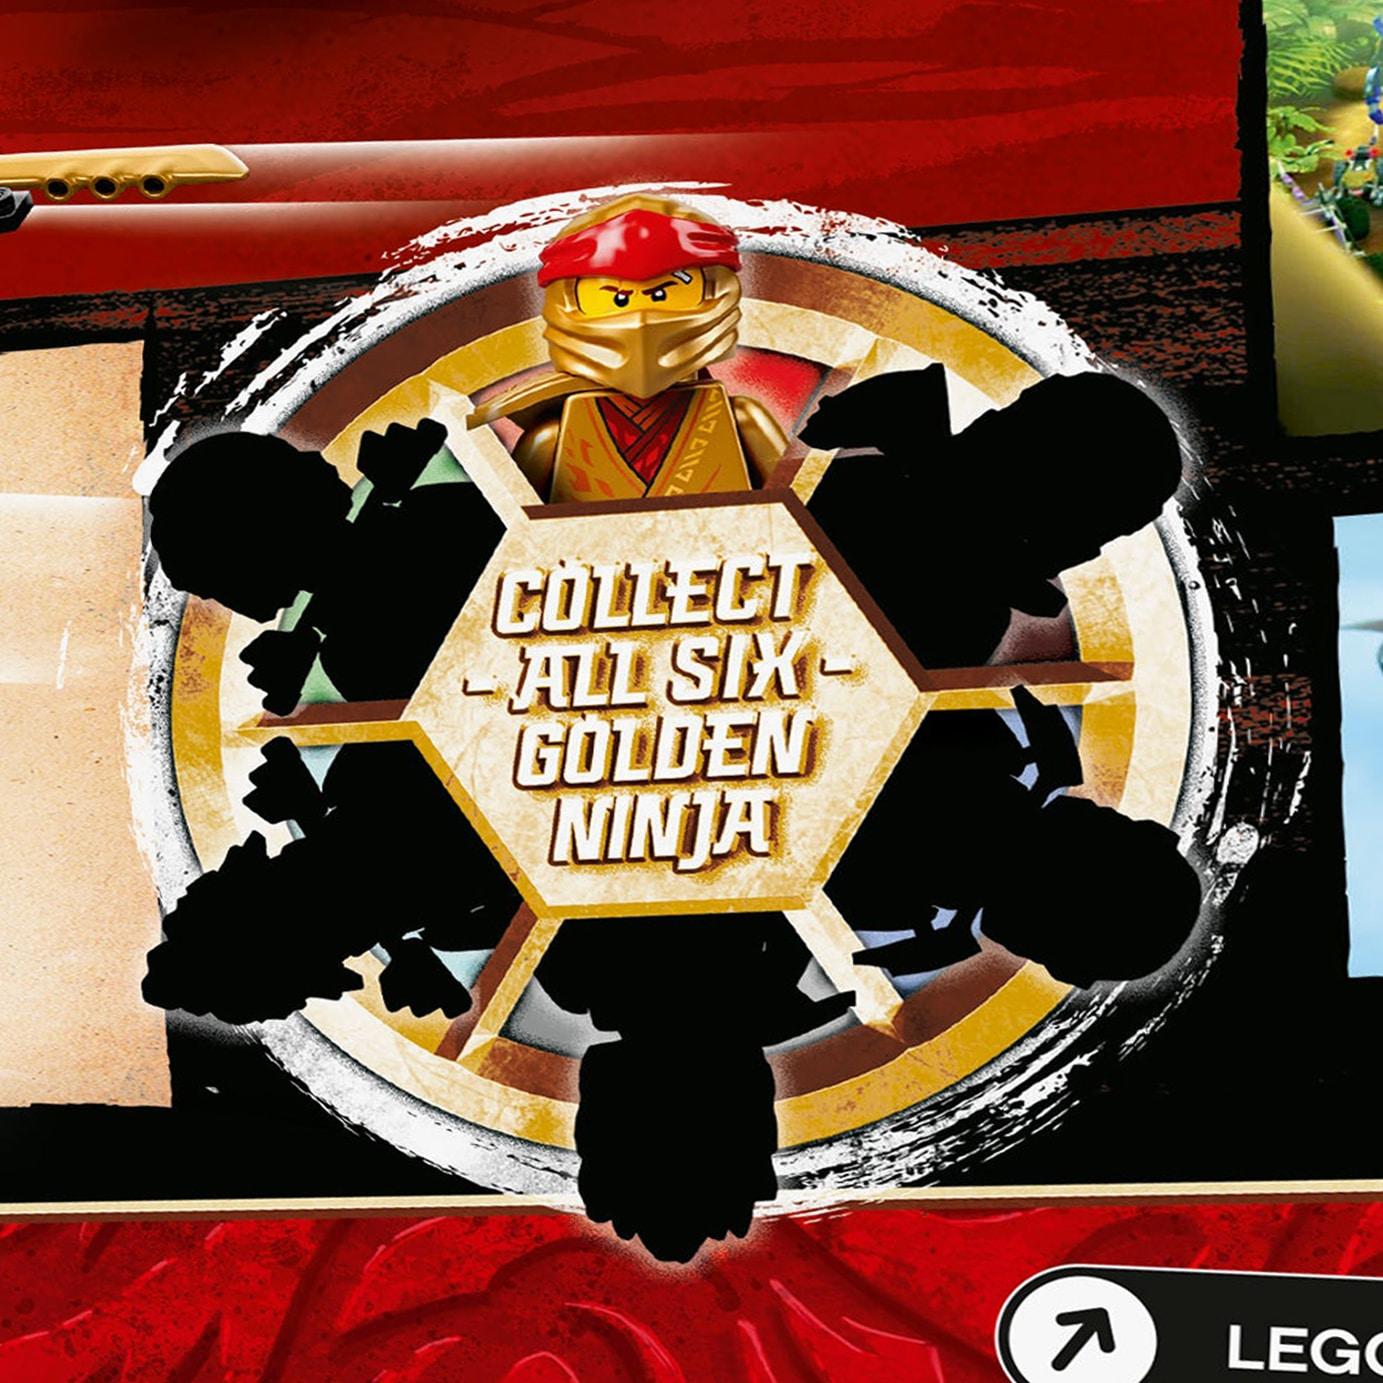 10 Jahre Ninjago Goldene Ninjas 6